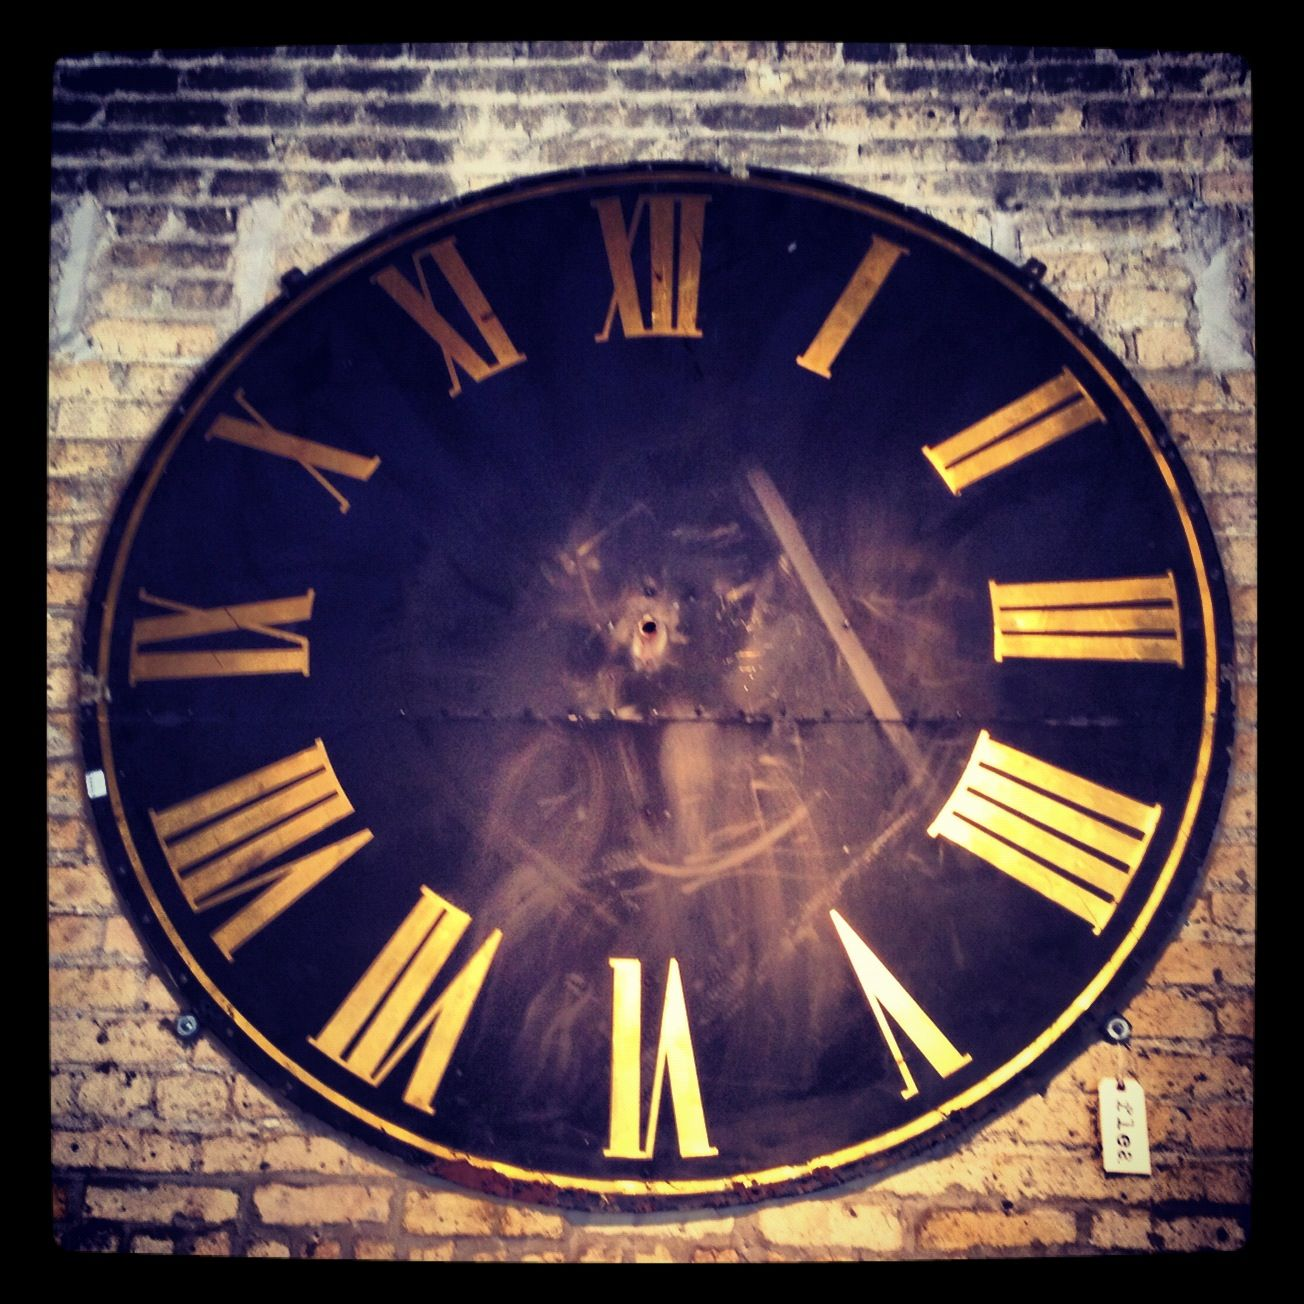 Large Antique Clock Face